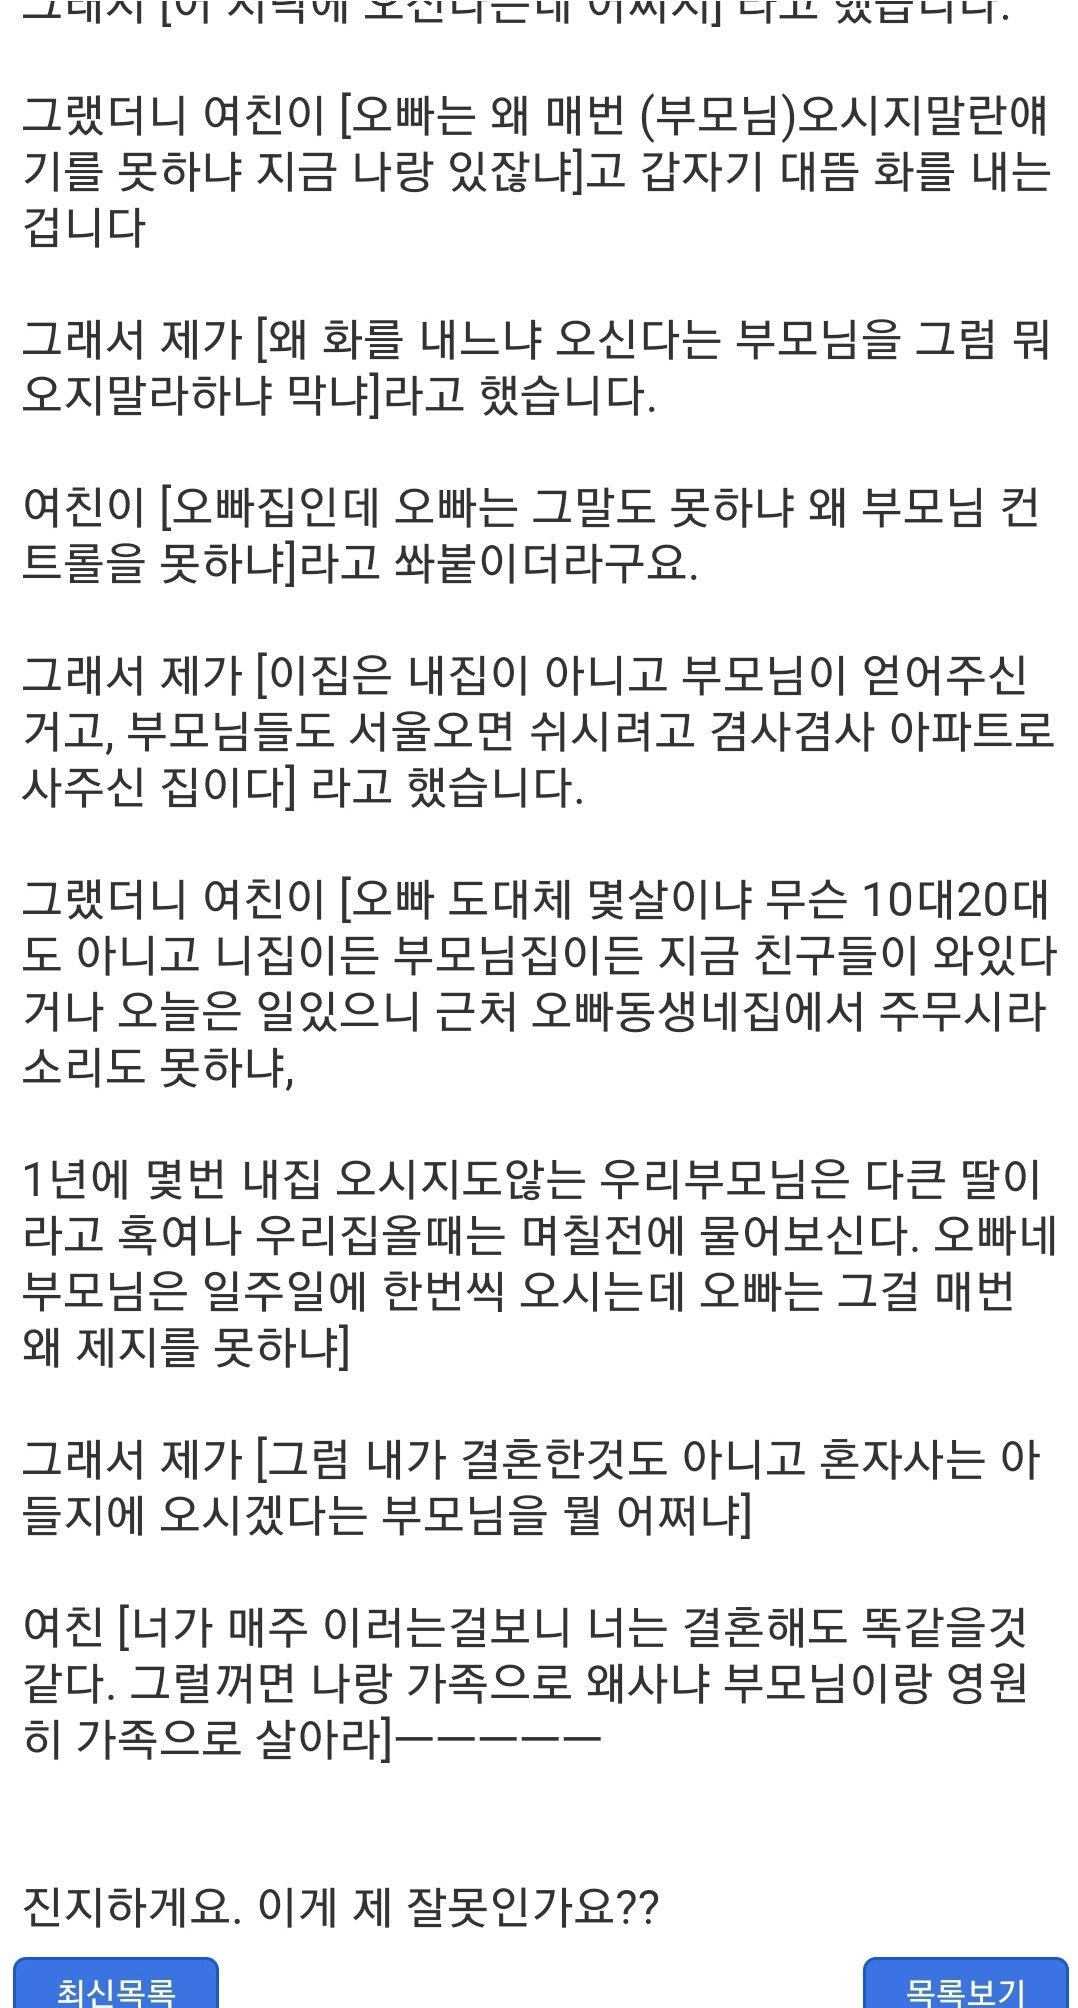 Screenshot_20200922-013749_Samsung Internet.jpg 현재 엠팍에서 핫한글